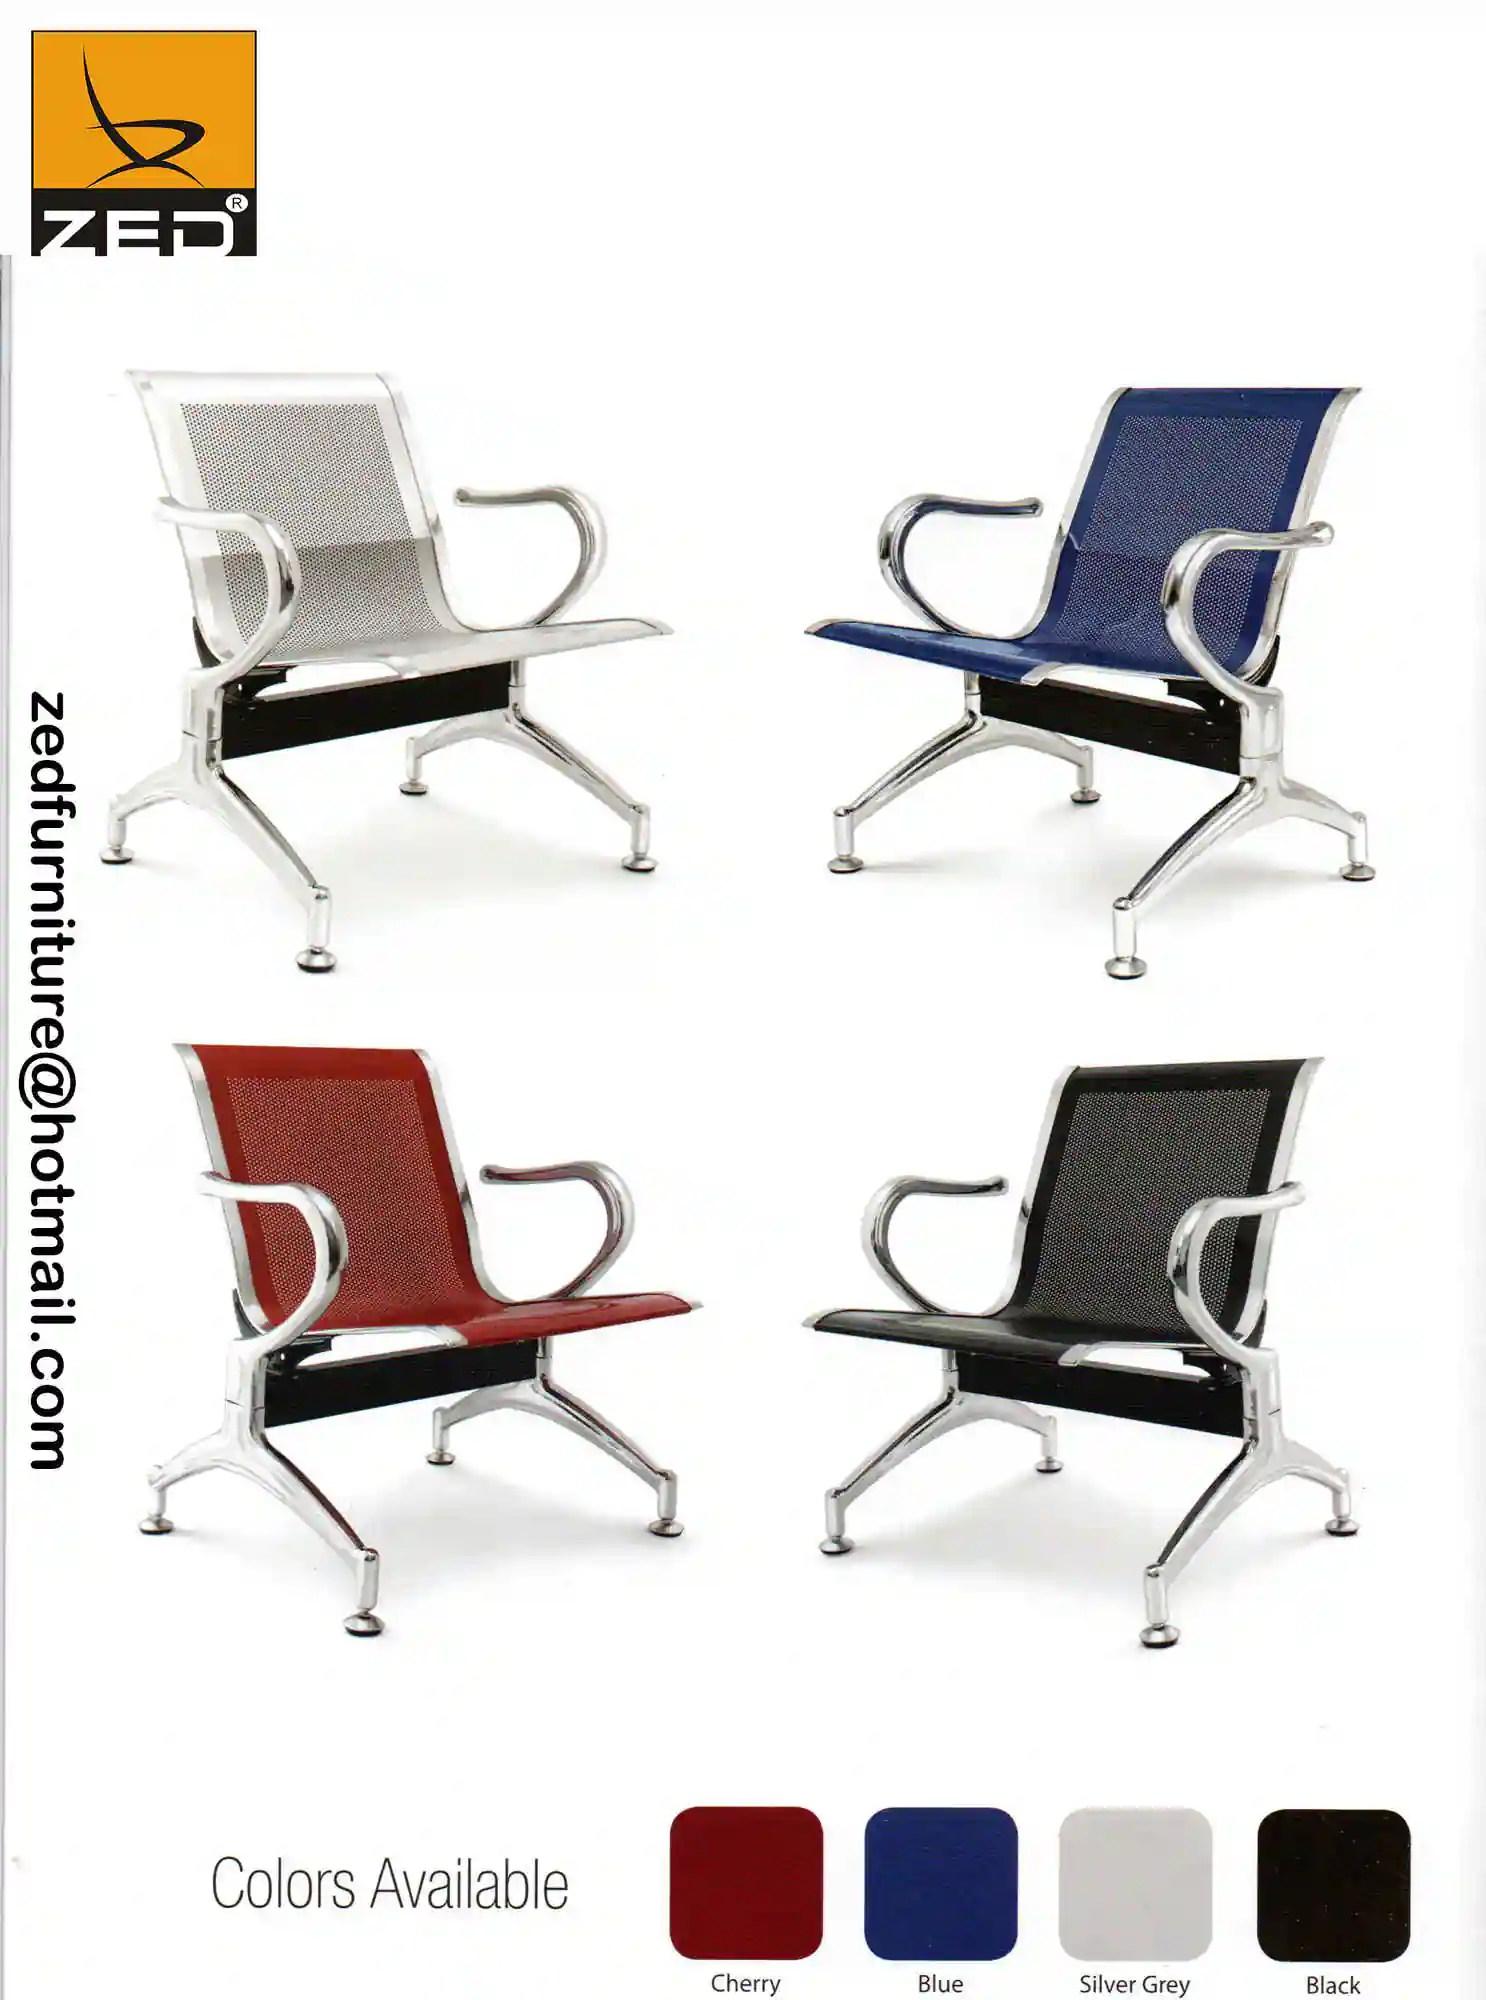 revolving chair in vadodara kitchen step stool zed furniture industries makarpura industrial estate manufacturers justdial